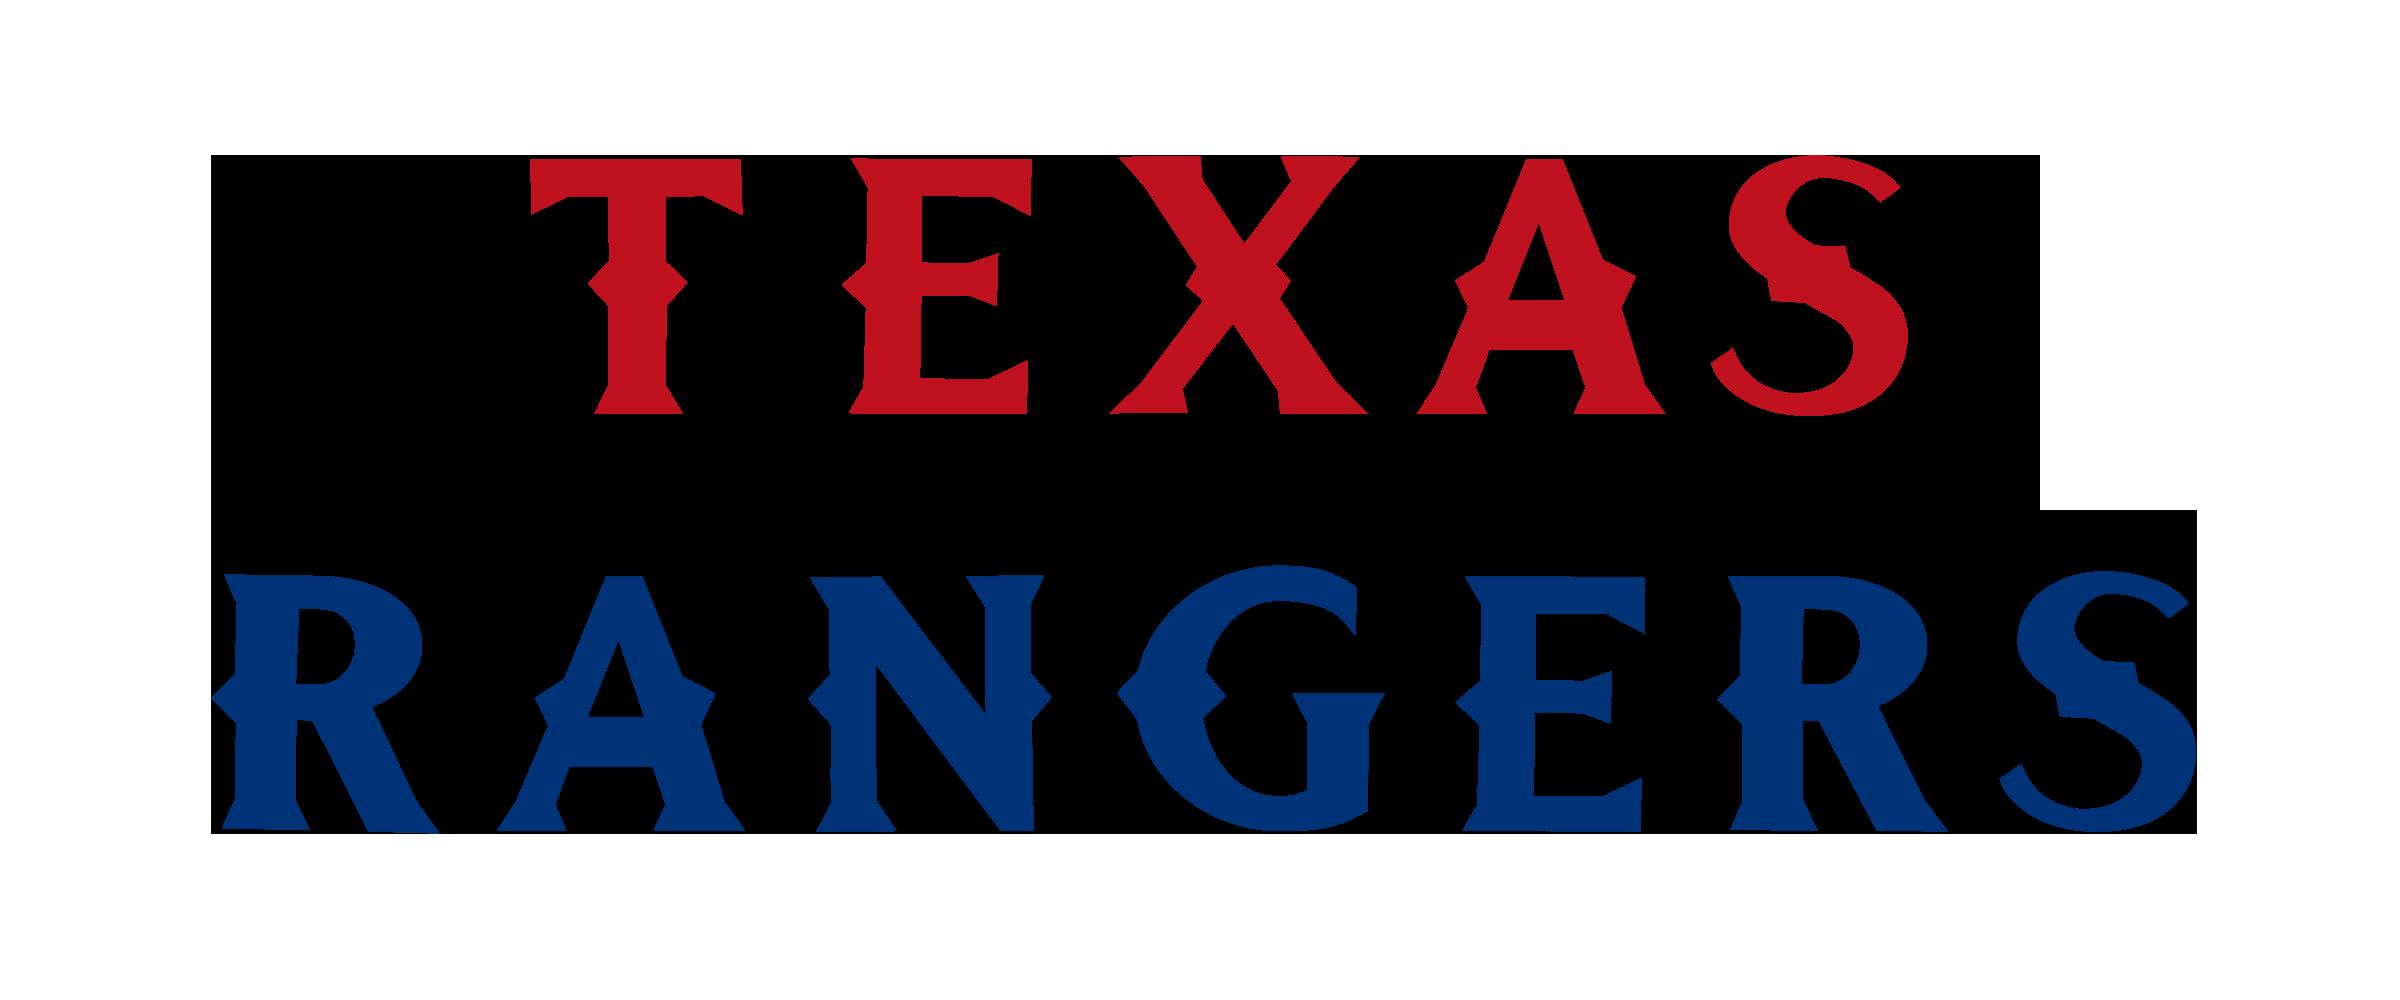 Texas rangers baseball clipart free graphic download Texas rangers Logos graphic download